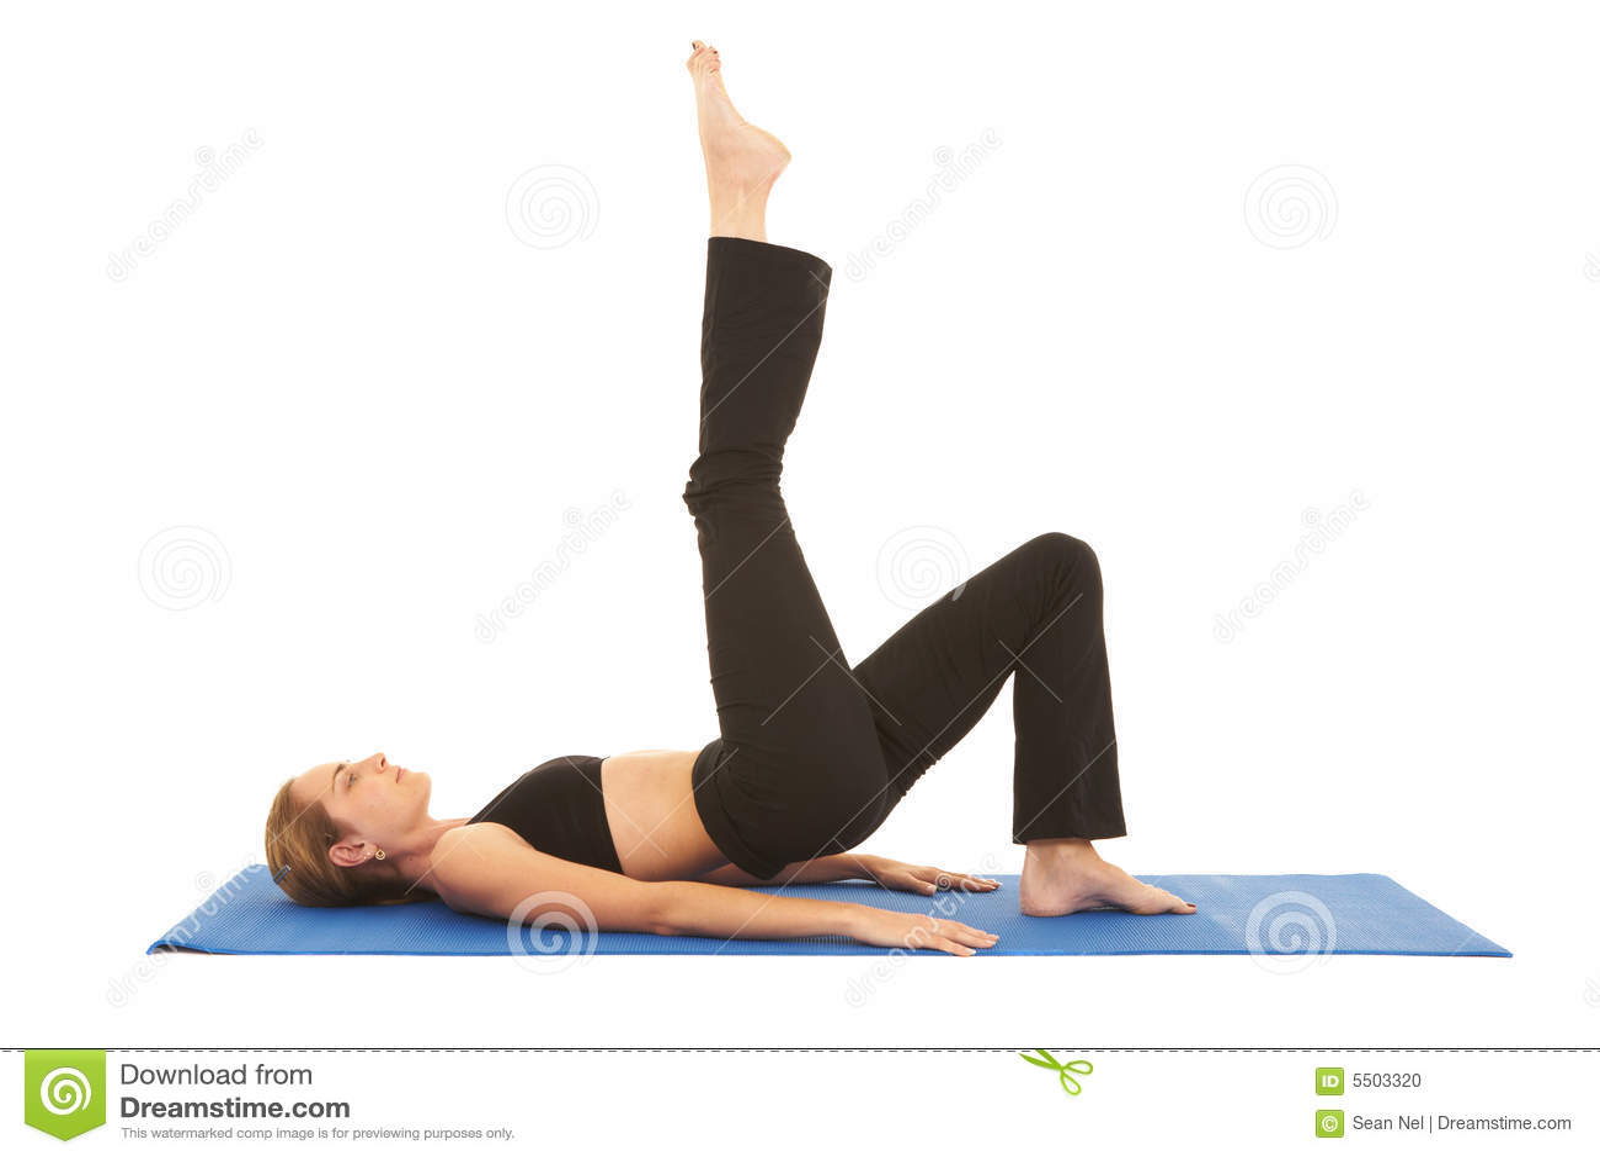 Pilates Exercise Series Stock Photo Image 5503320